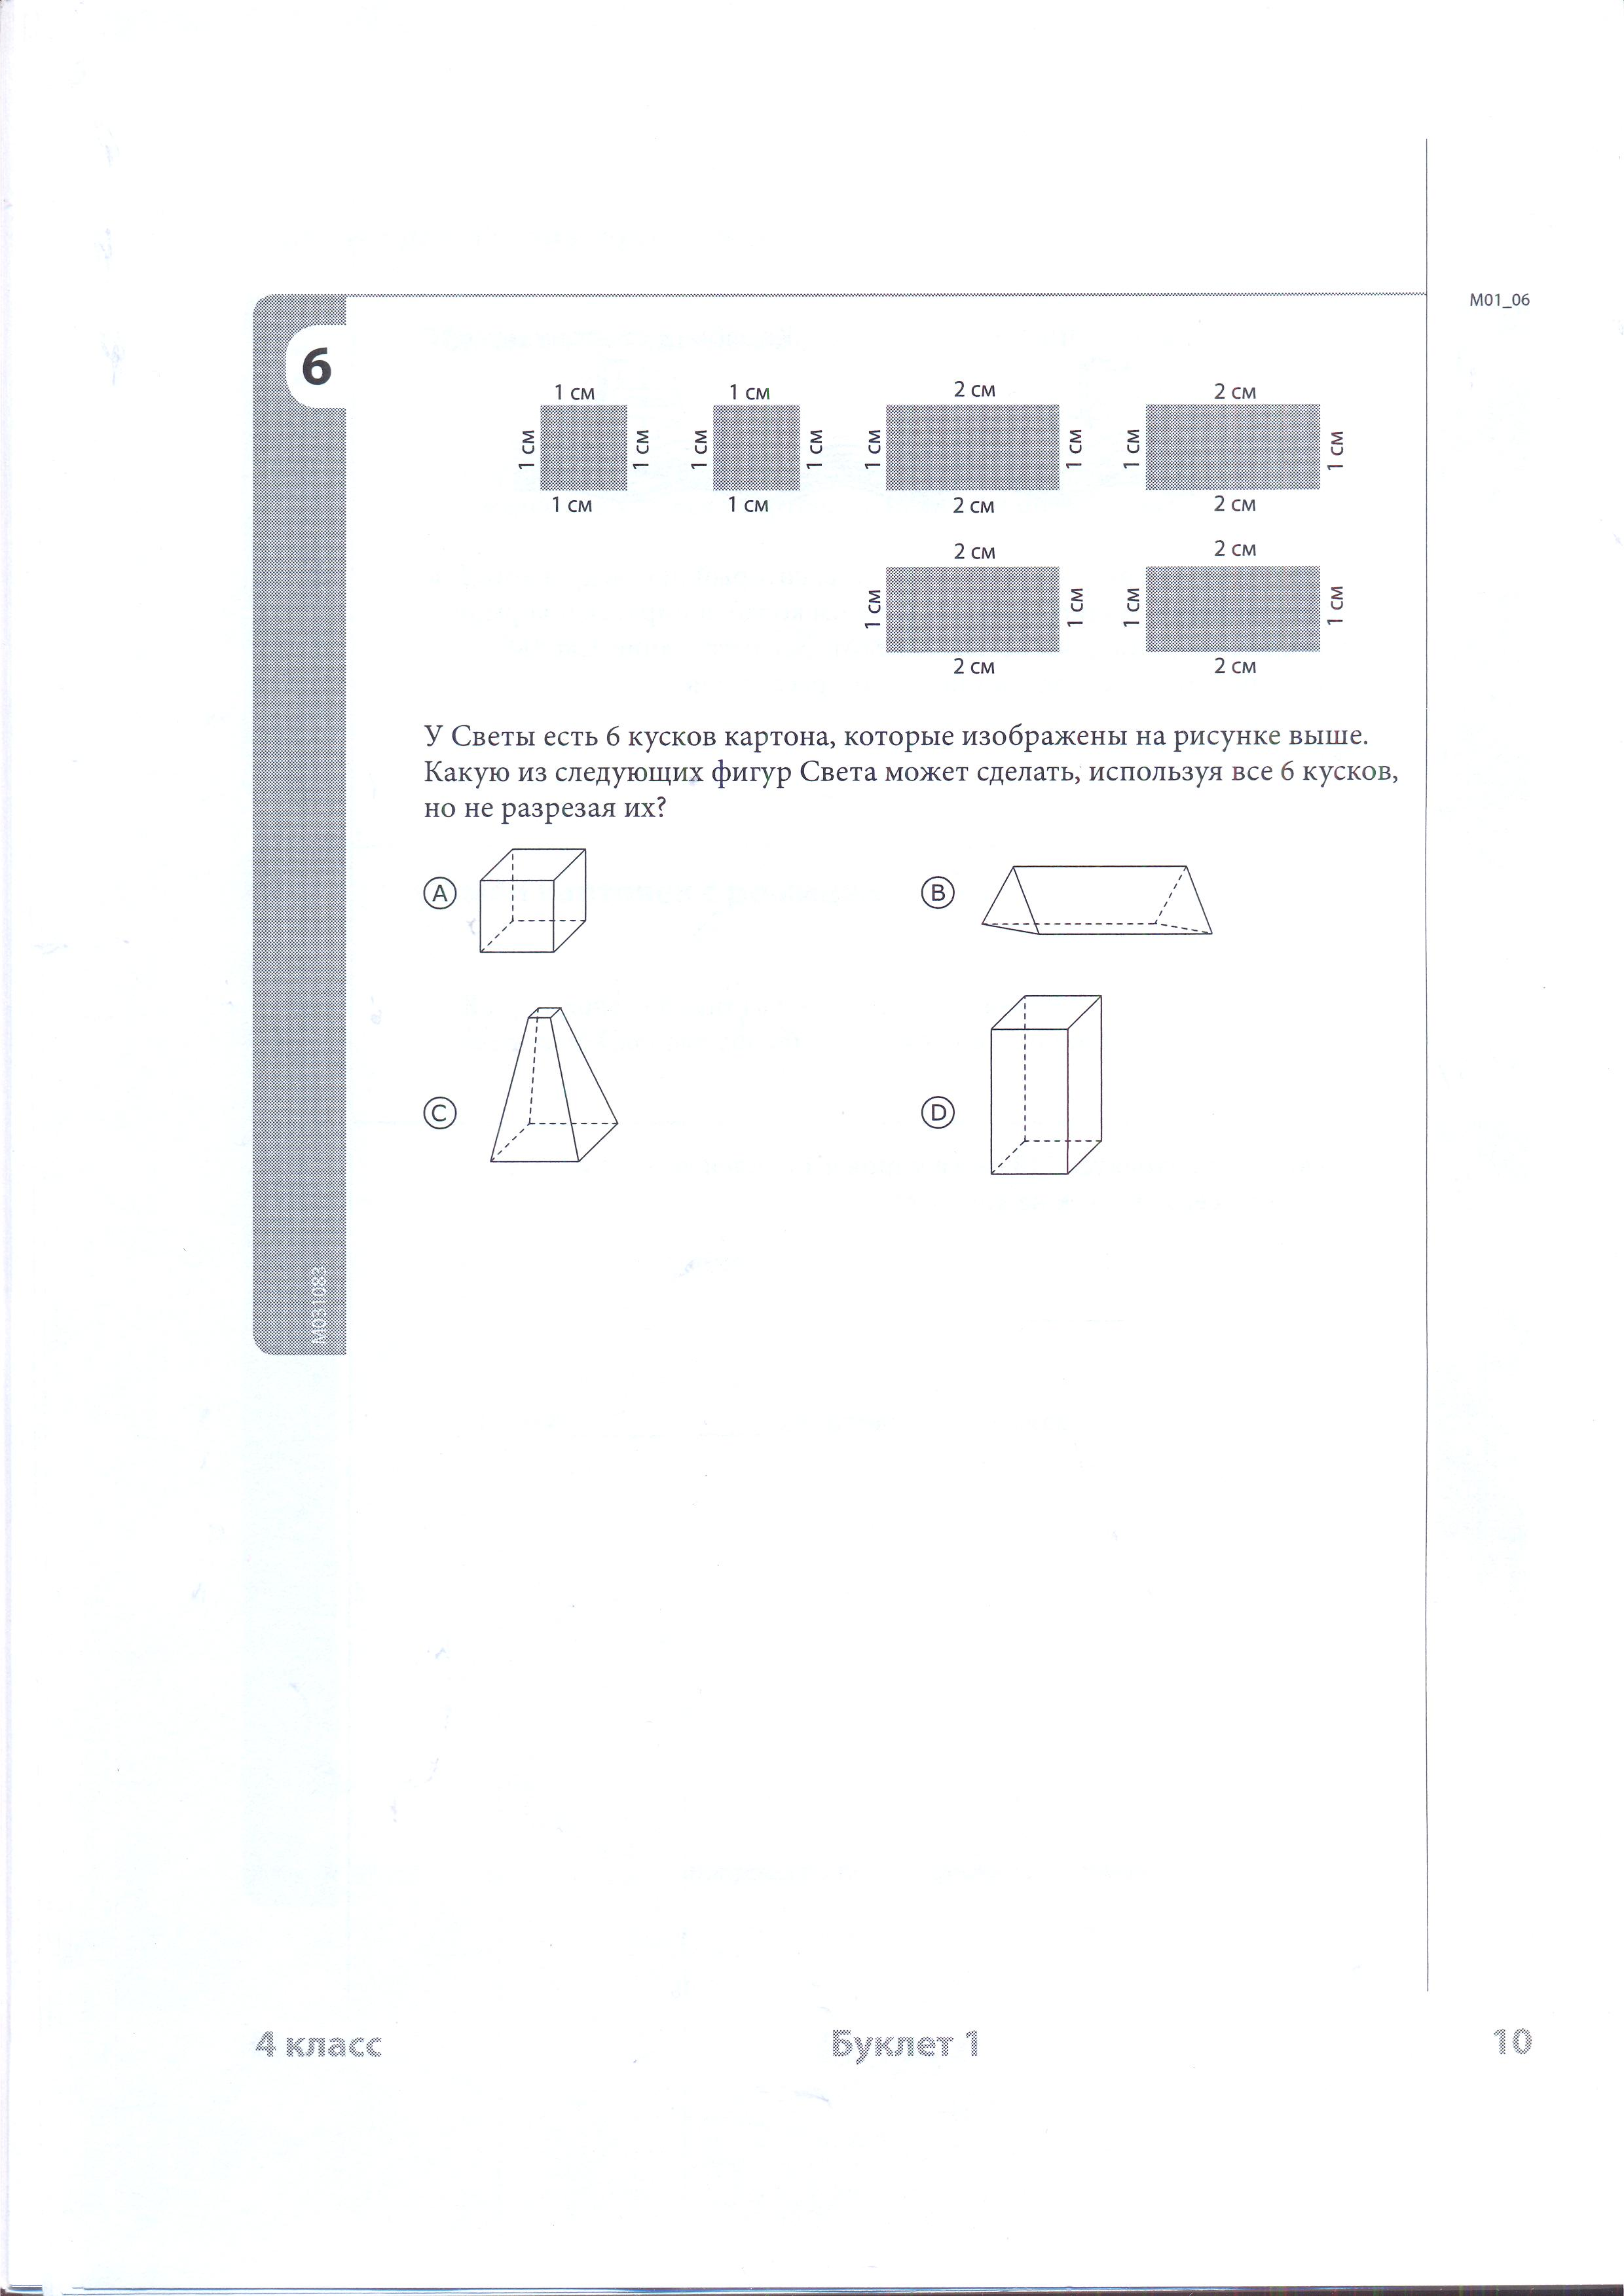 H:\Доклад ТИМСС Алматы 8.04.2014\TIMSS MATEM 4 kl_1 var\Matematic_4 kl_1 var0007.jpg